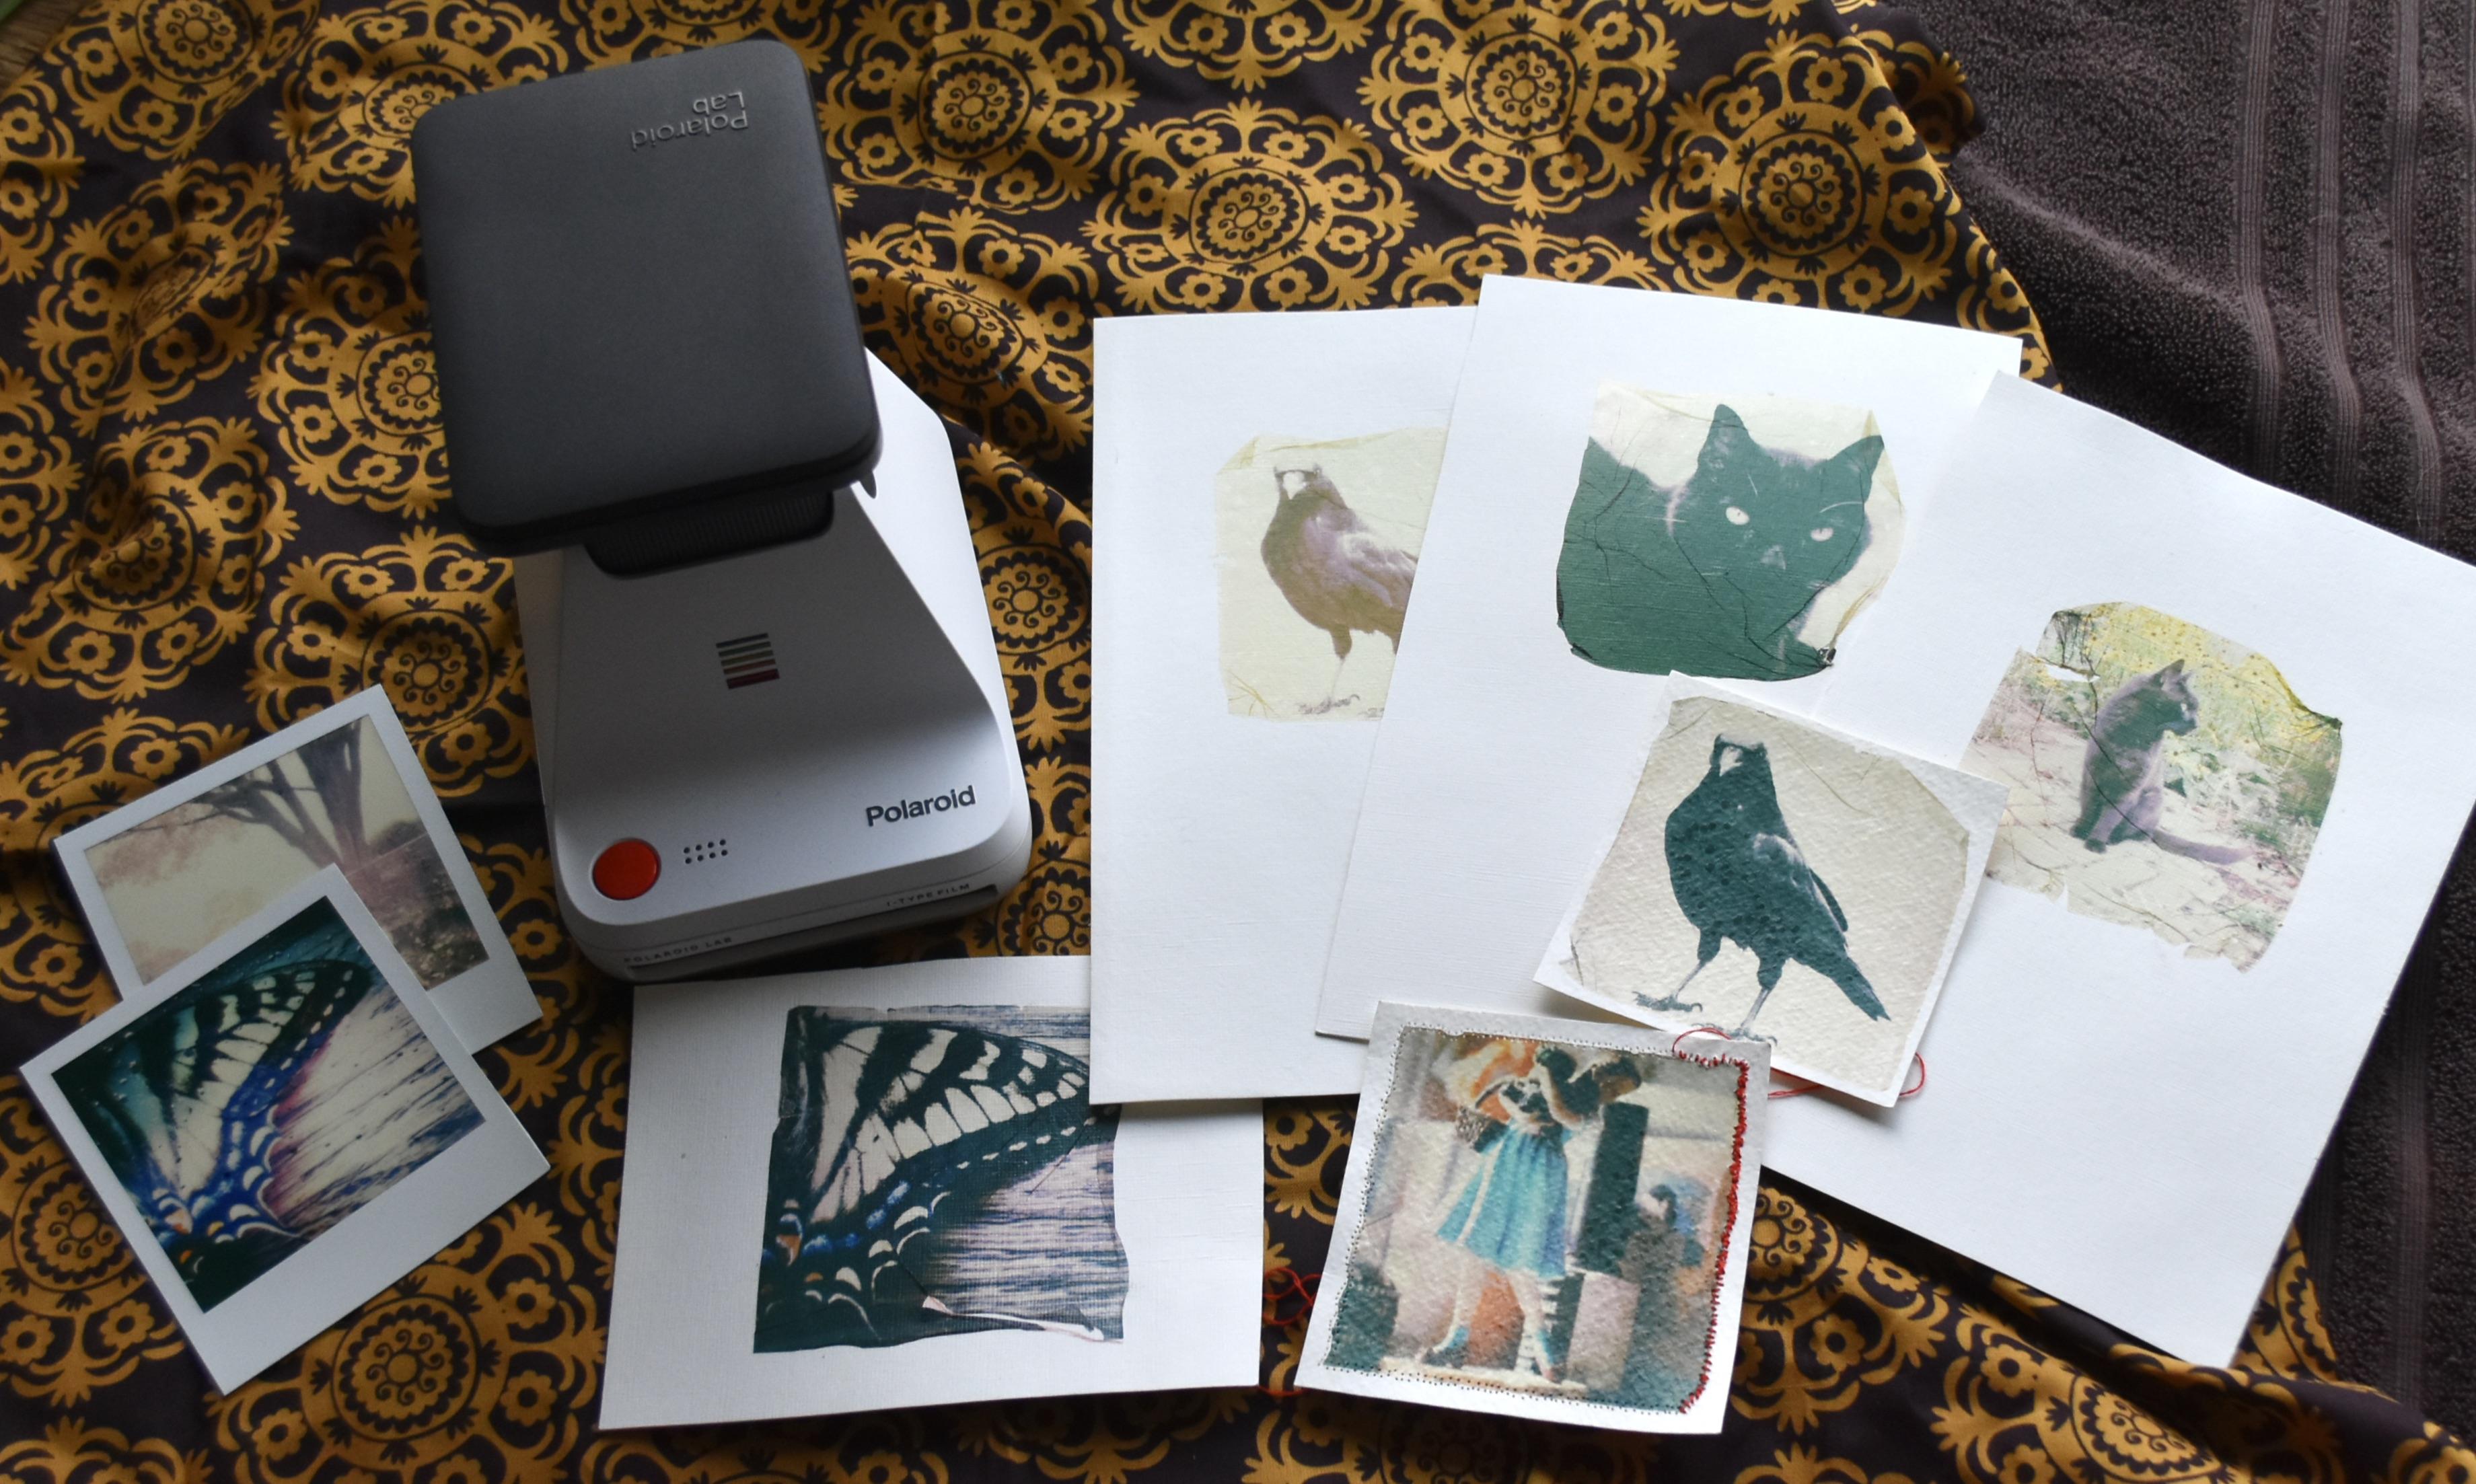 Experimenting: Polaroid Photolab and Polaroid Transfers